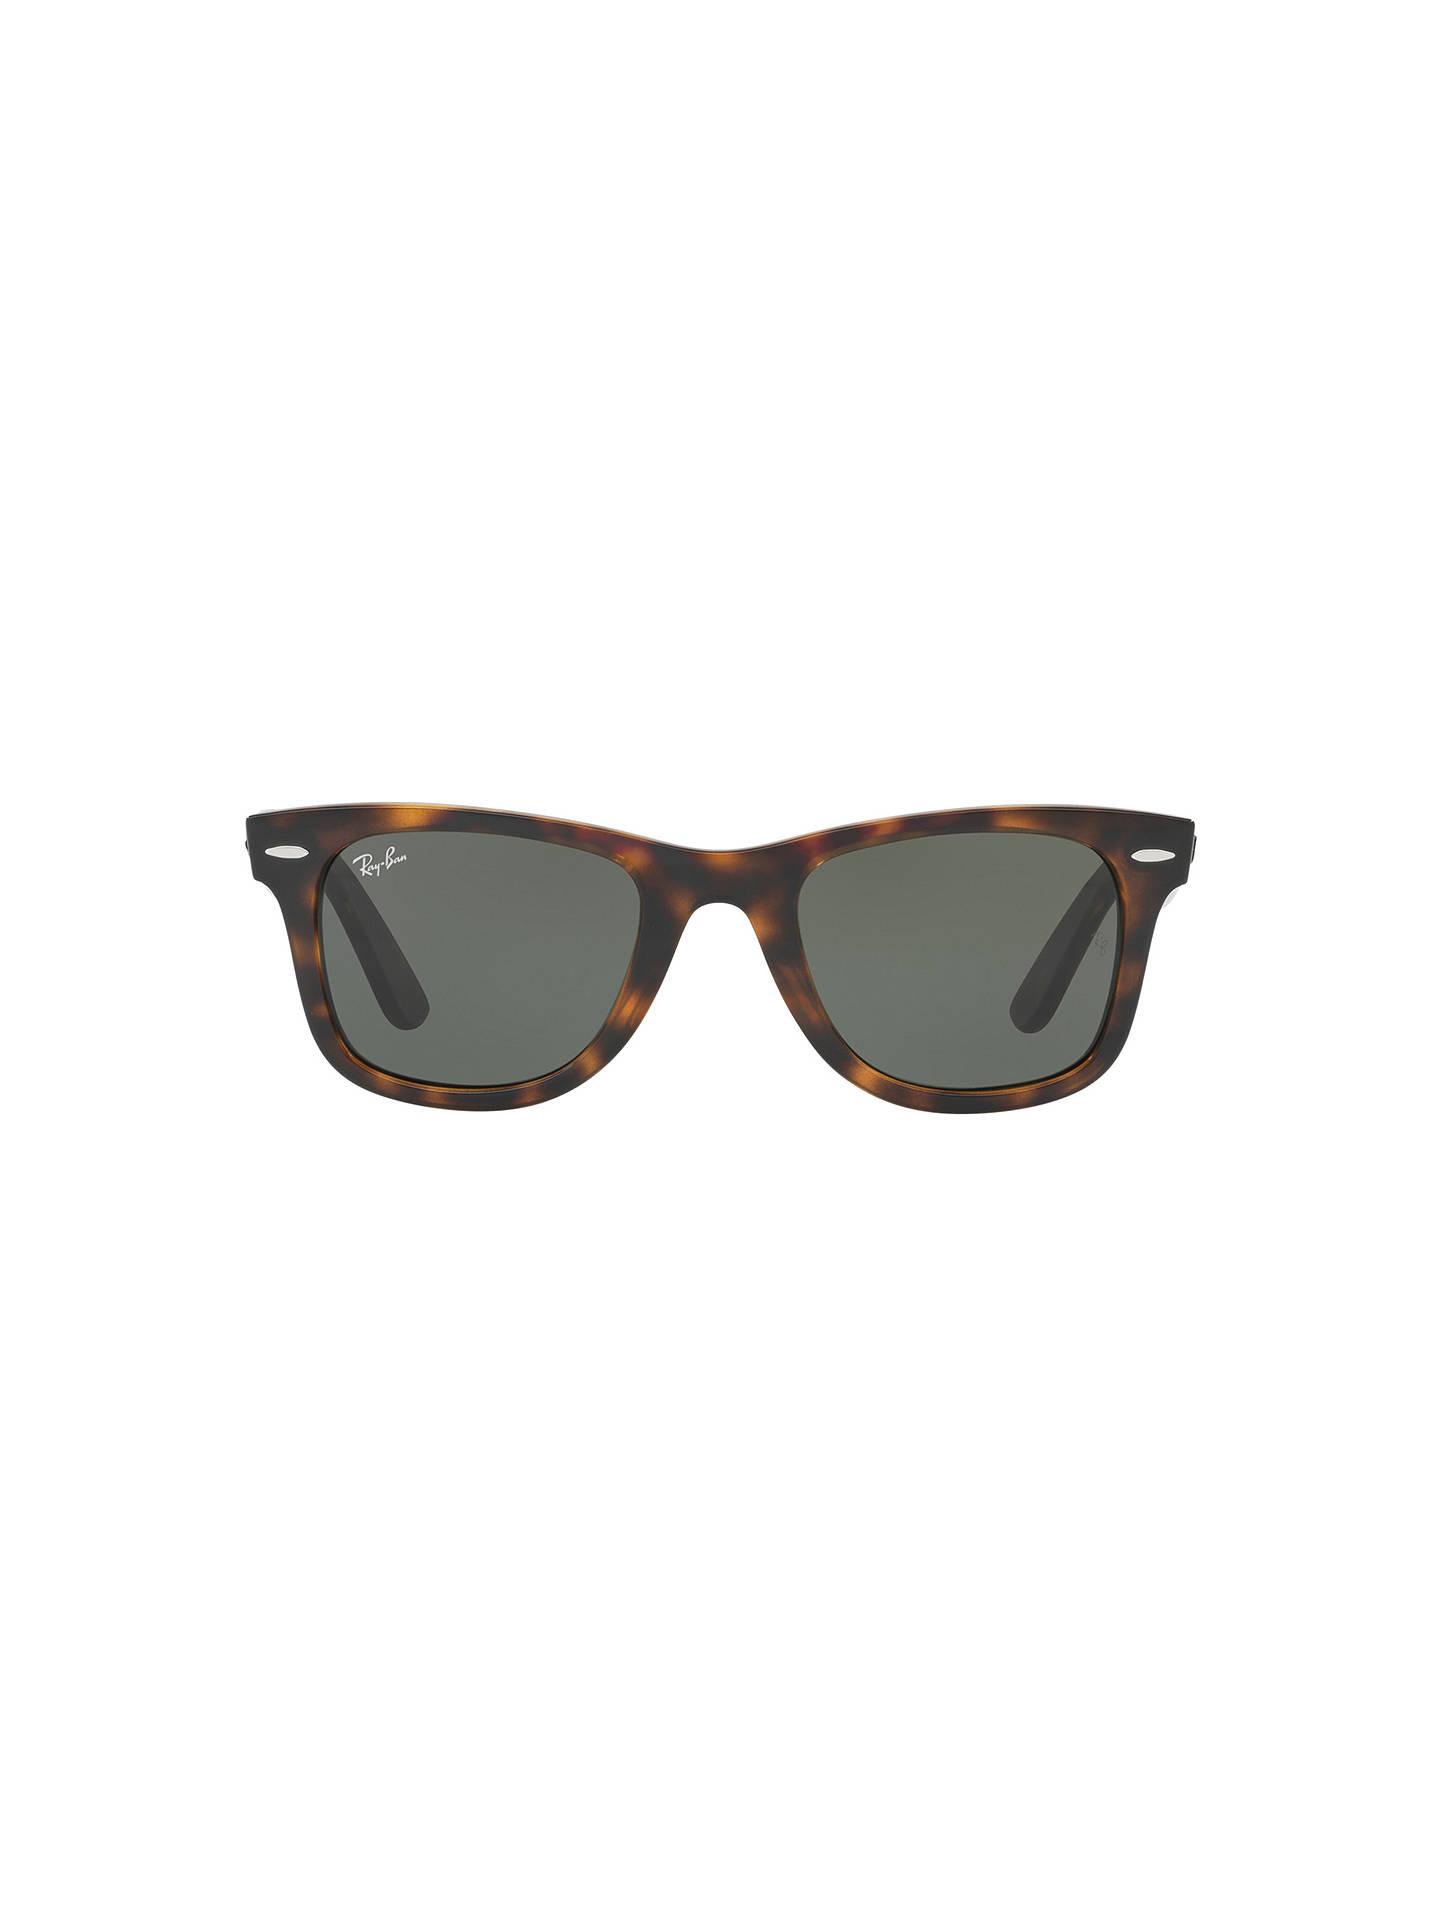 c15d4822ee9 shop ray ban 0rb4340 wayfarer ease blue sun 272c9 e7bf4  denmark 50 off  buyray ban rb4340 wayfarer sunglasses tortoise grey online at johnlewis  4862e f1e95 ...